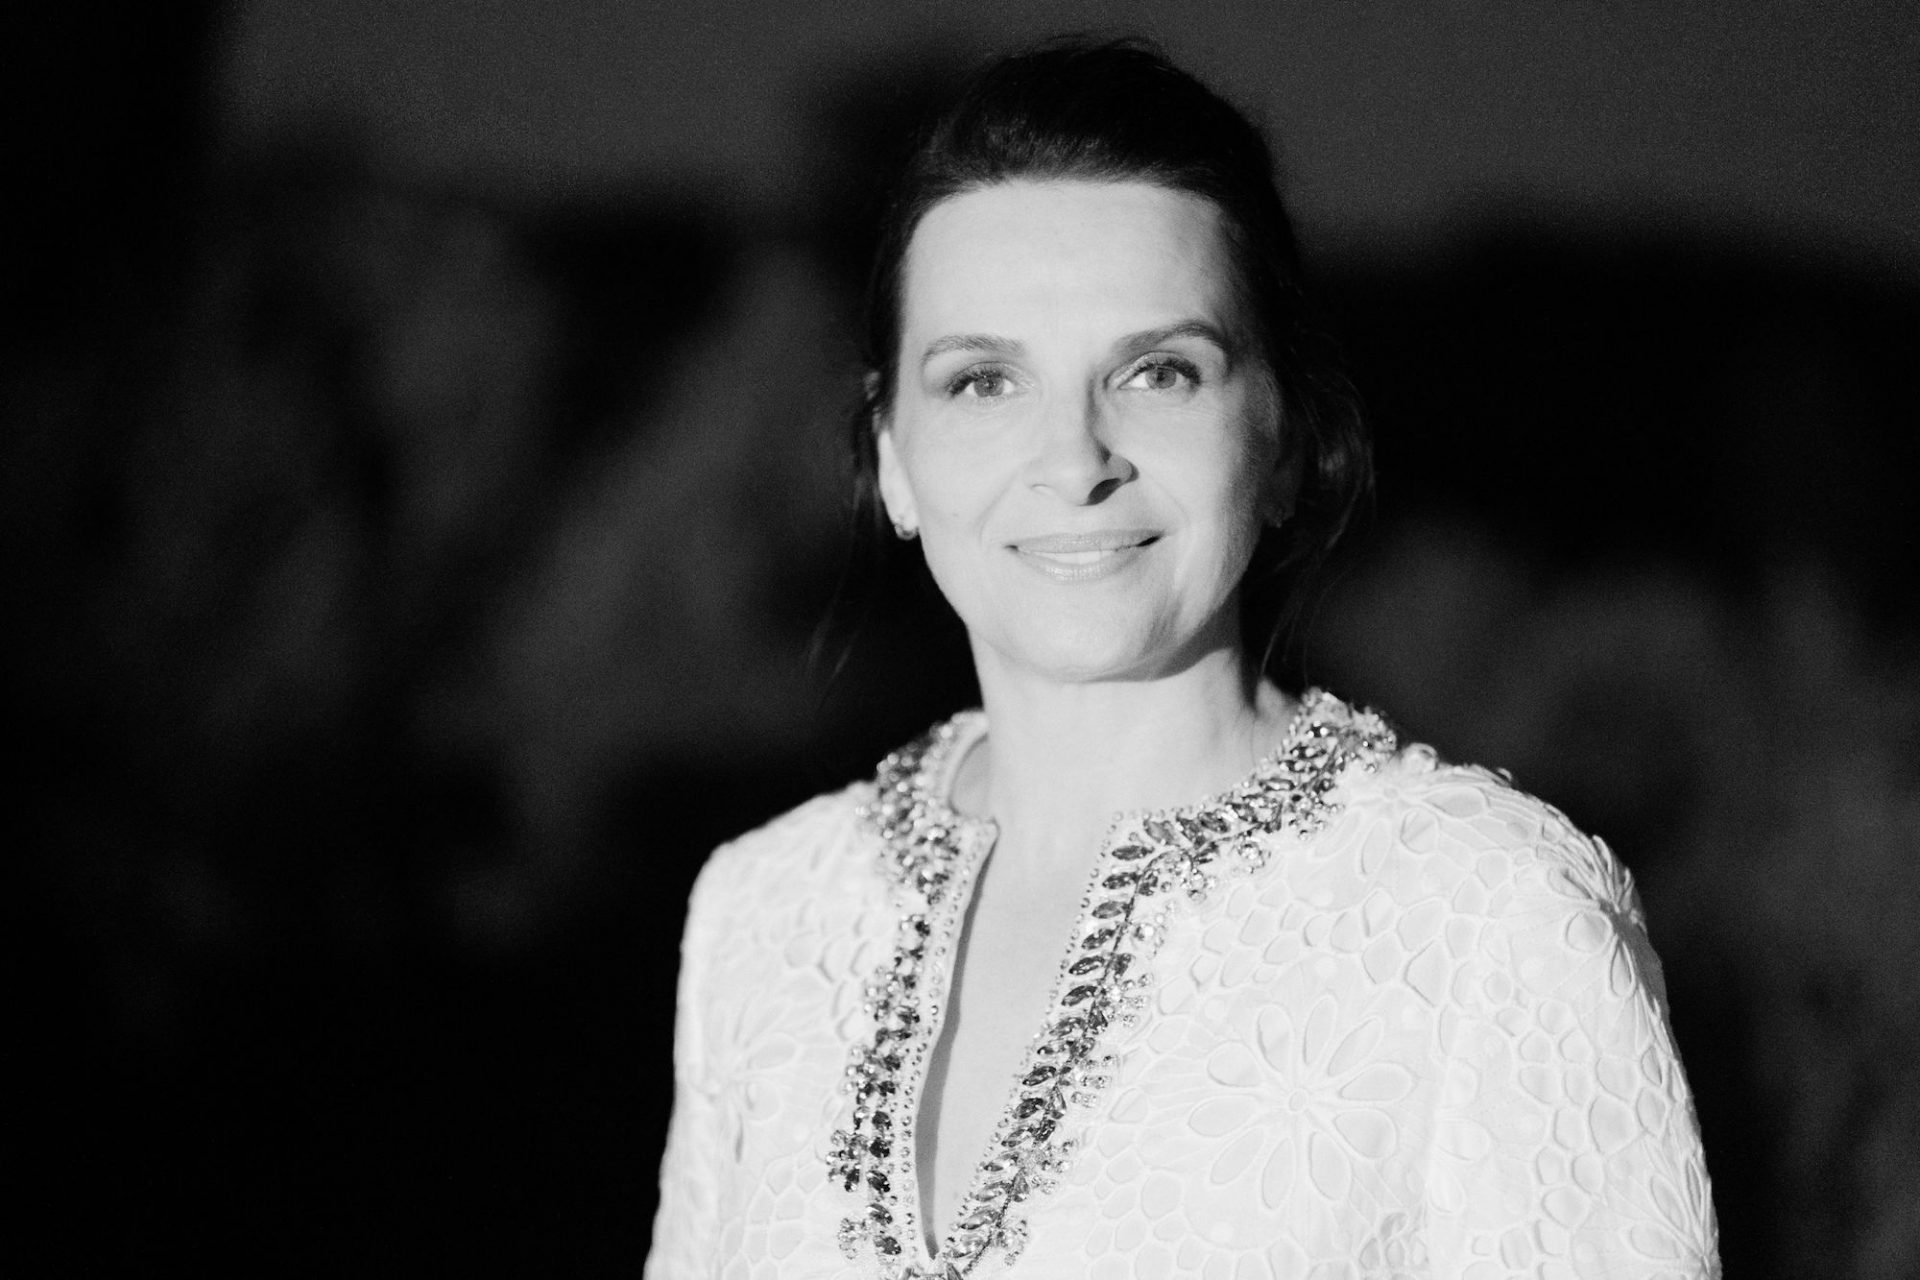 Juliette Binoche@laurentparienti